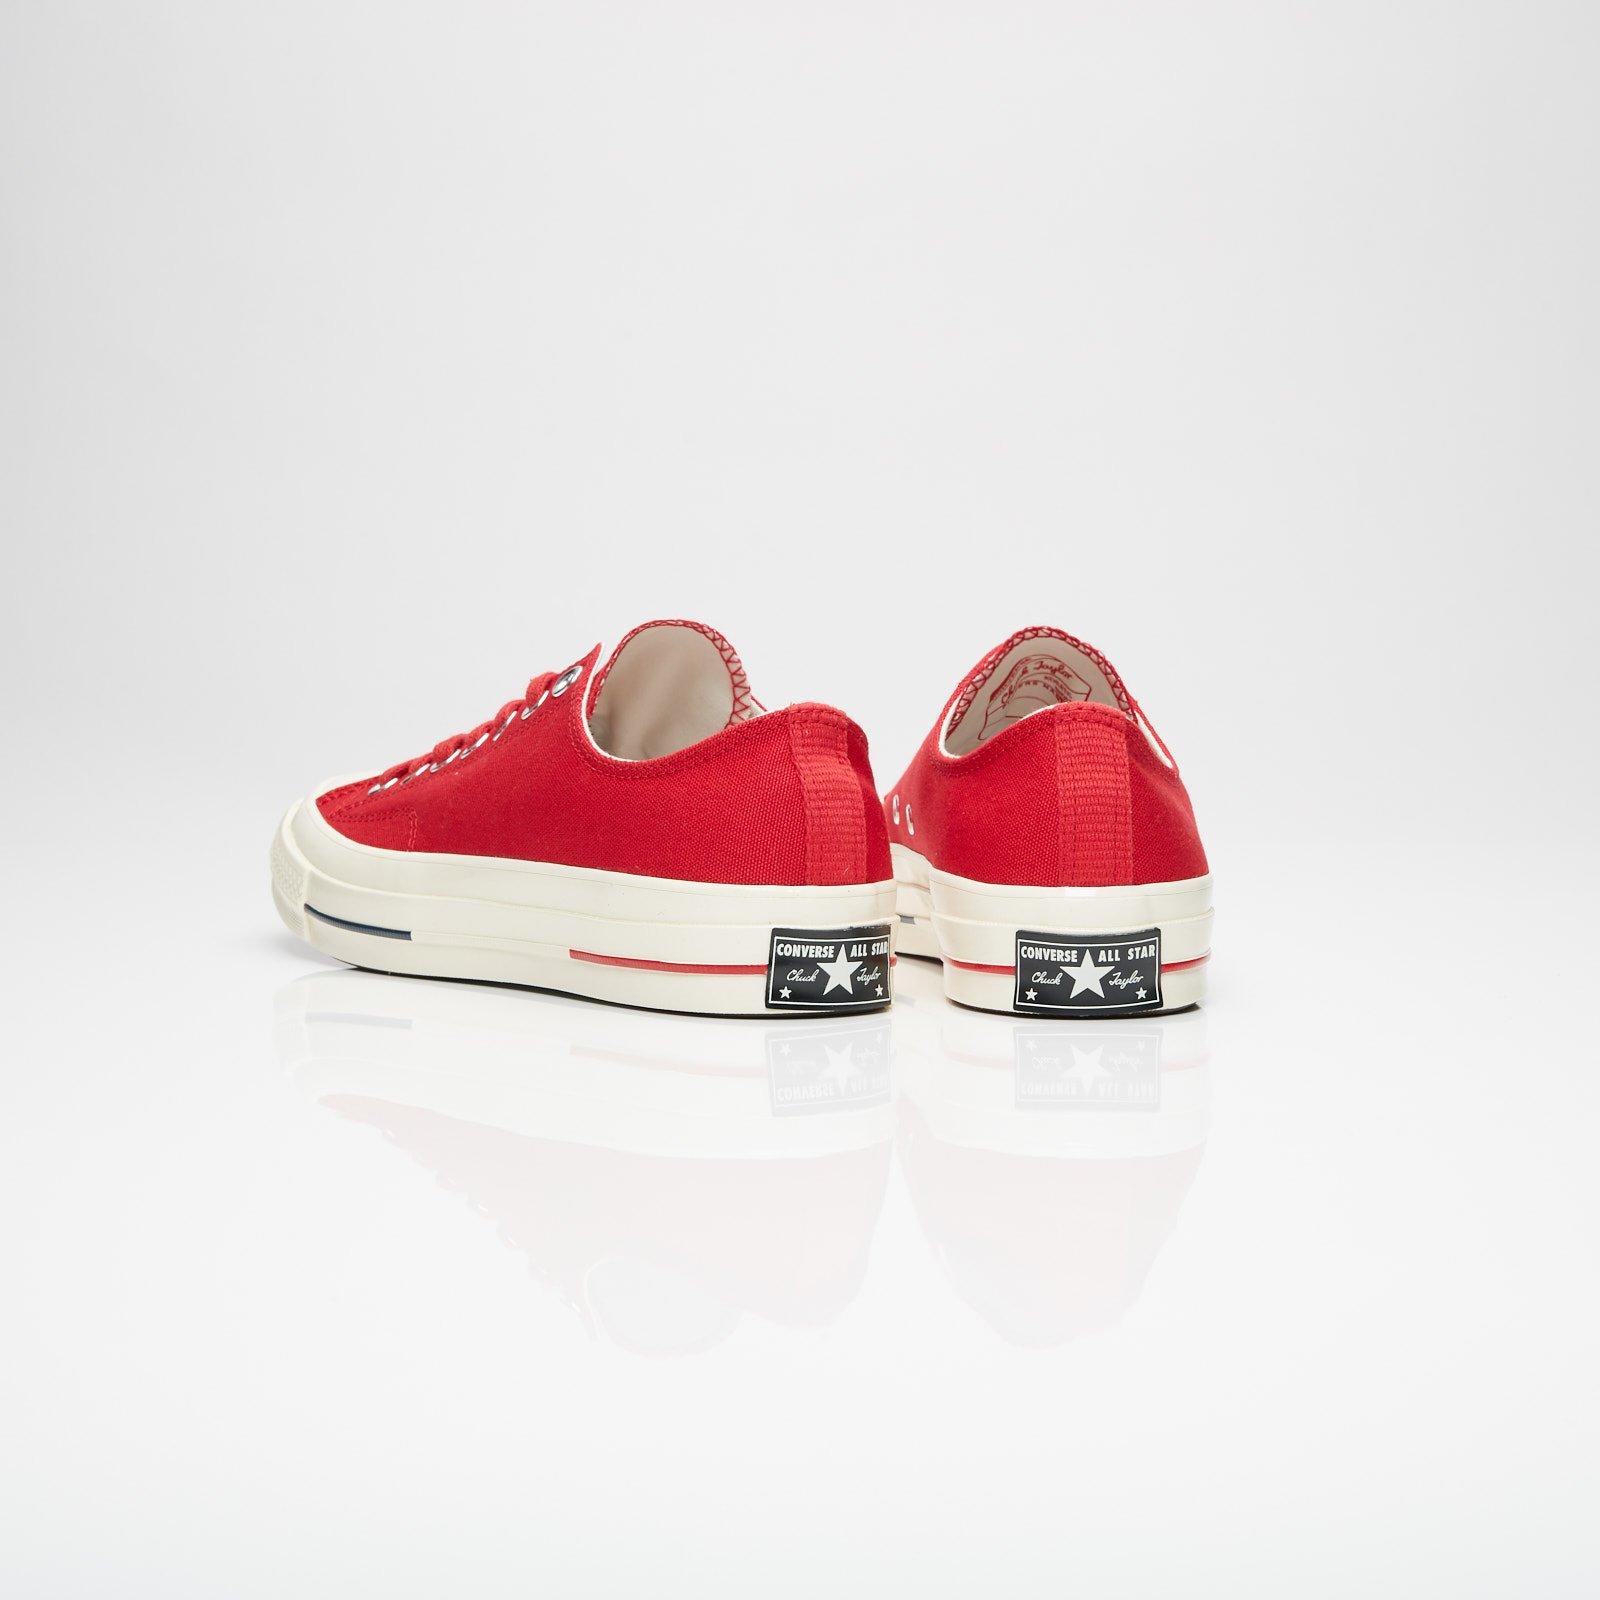 c8162478ea Converse Chuck 70 Ox - 160493c - Sneakersnstuff   sneakers ...